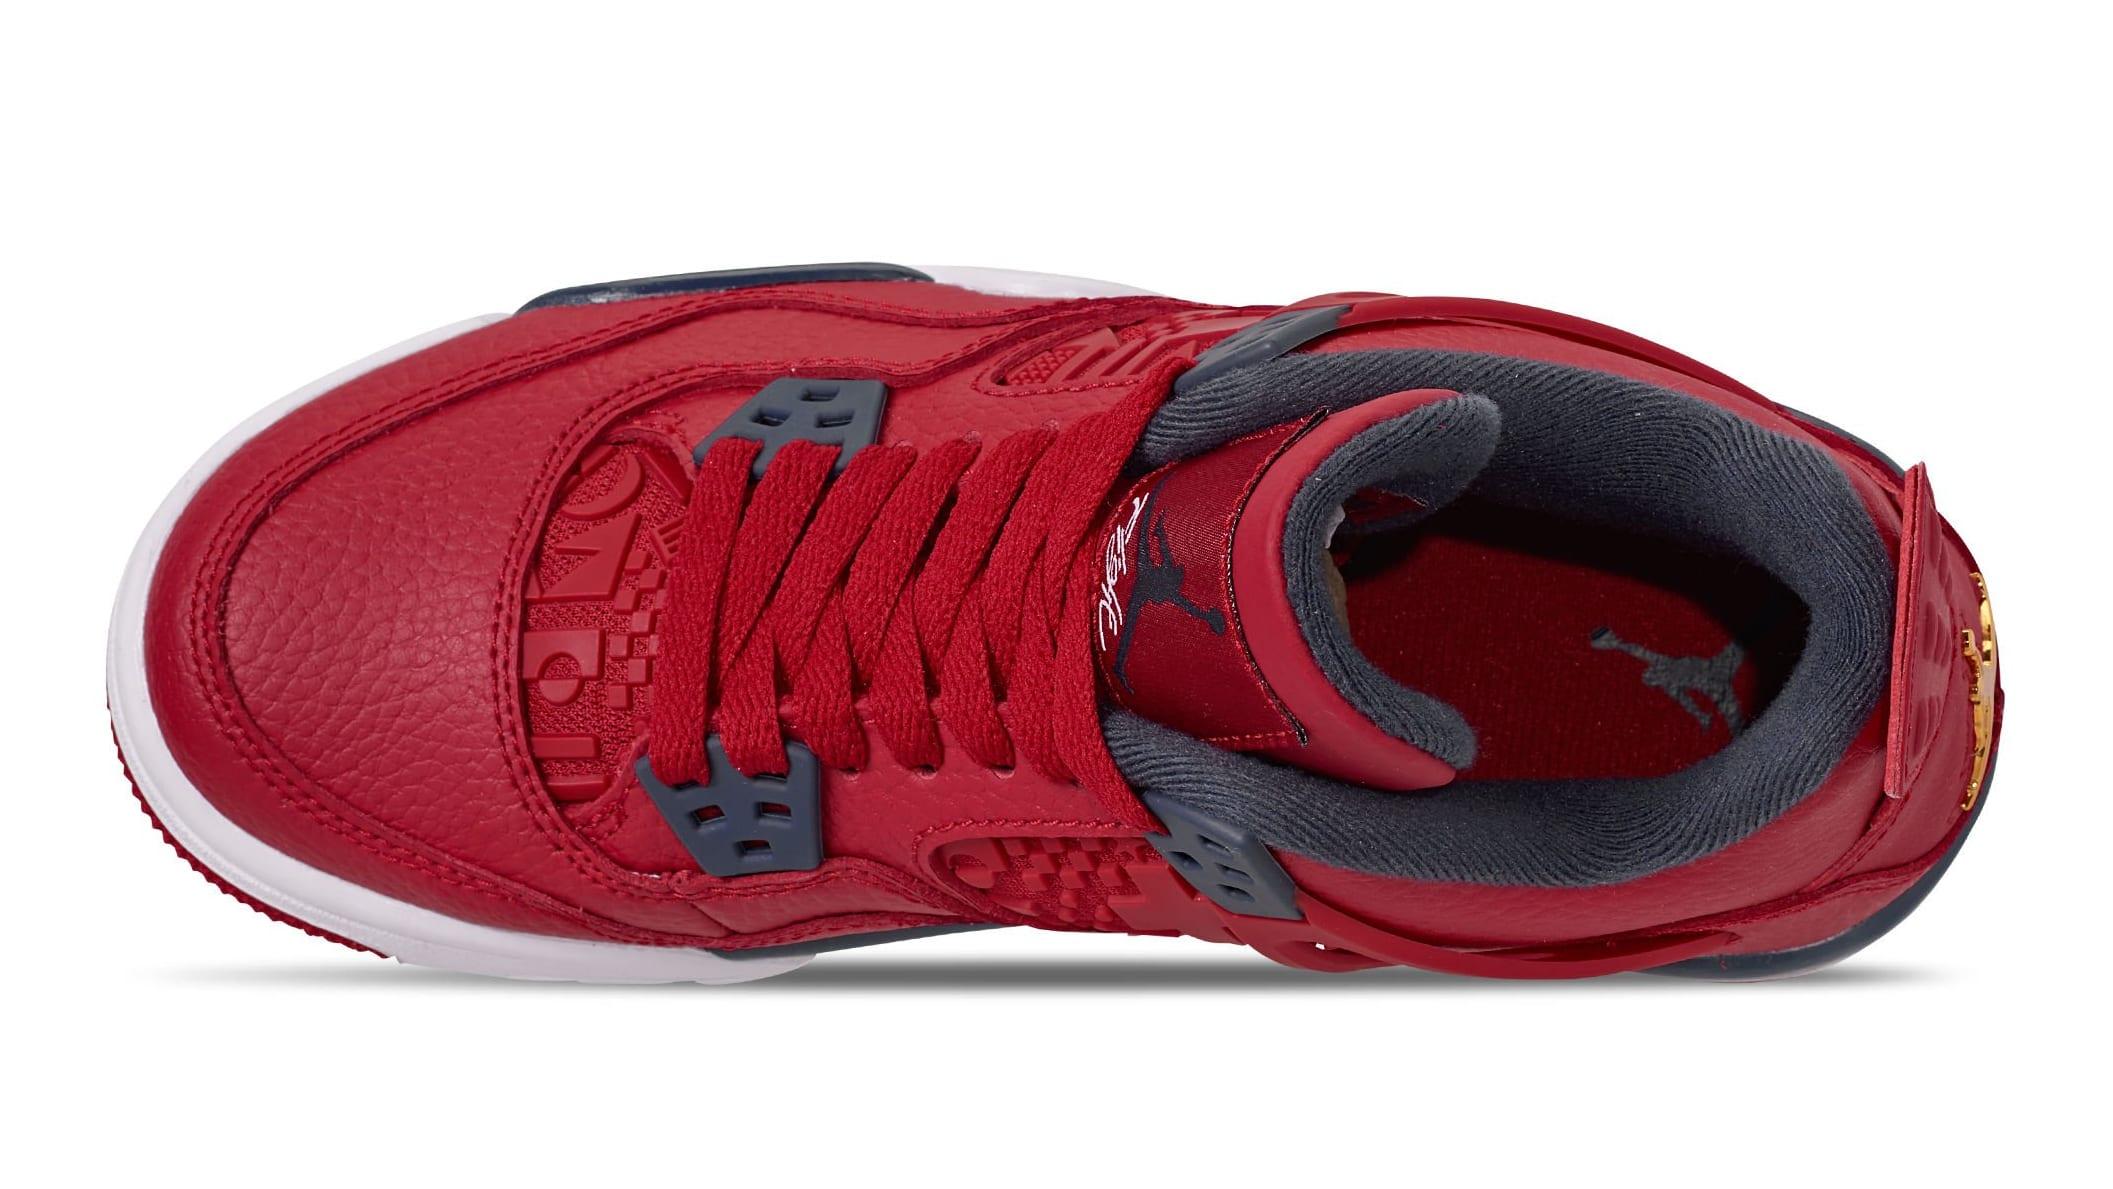 Air Jordan 4 Retro SE 'Fiba' Gym Red/White/Metallic Gold/Obsidian CI1184-617 (Top)